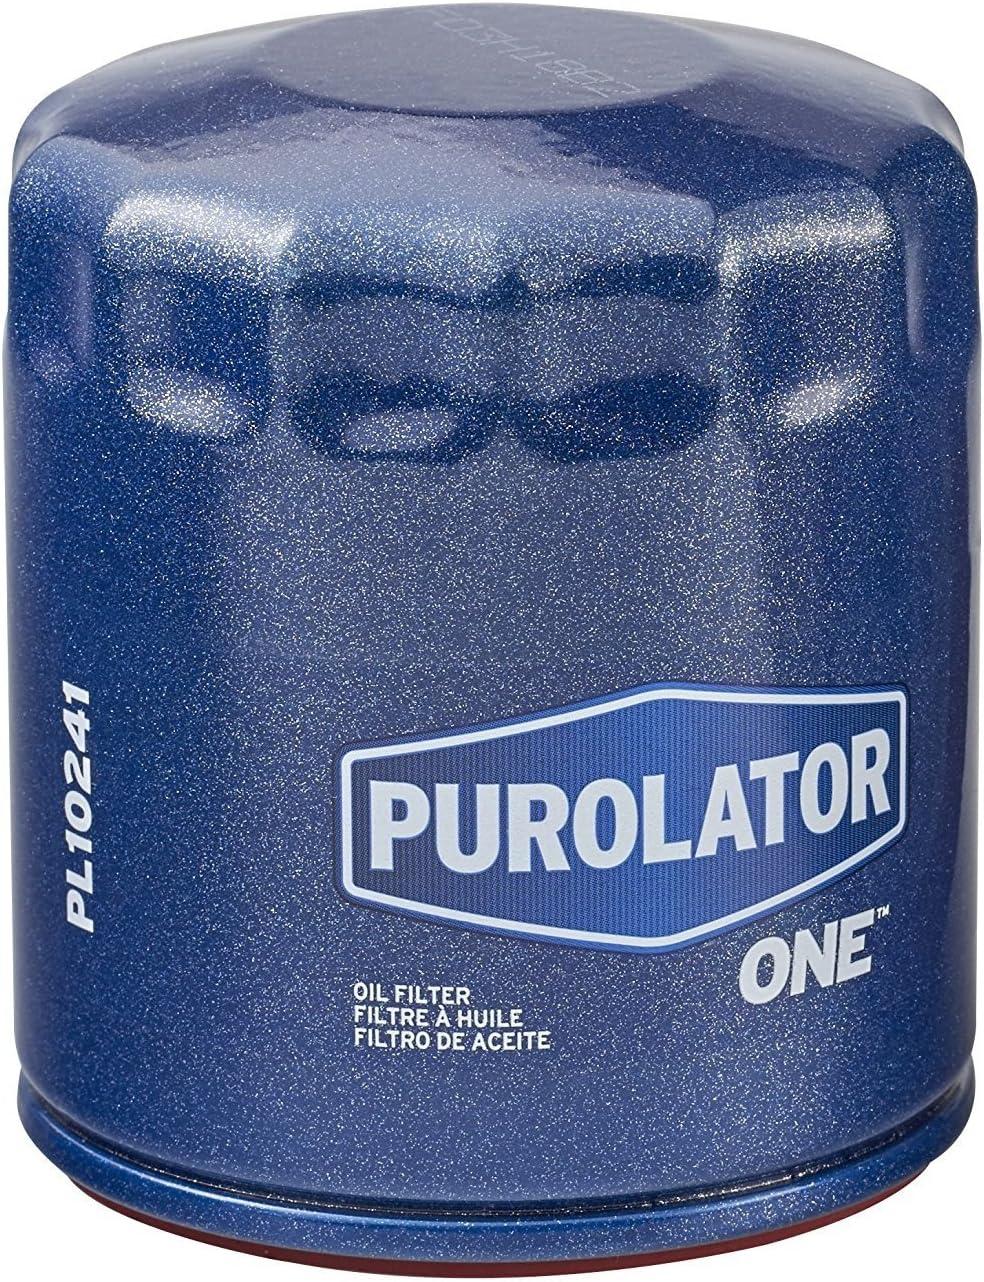 Purolator PL10241 PurolatorONE Oil Filter Pack of 6